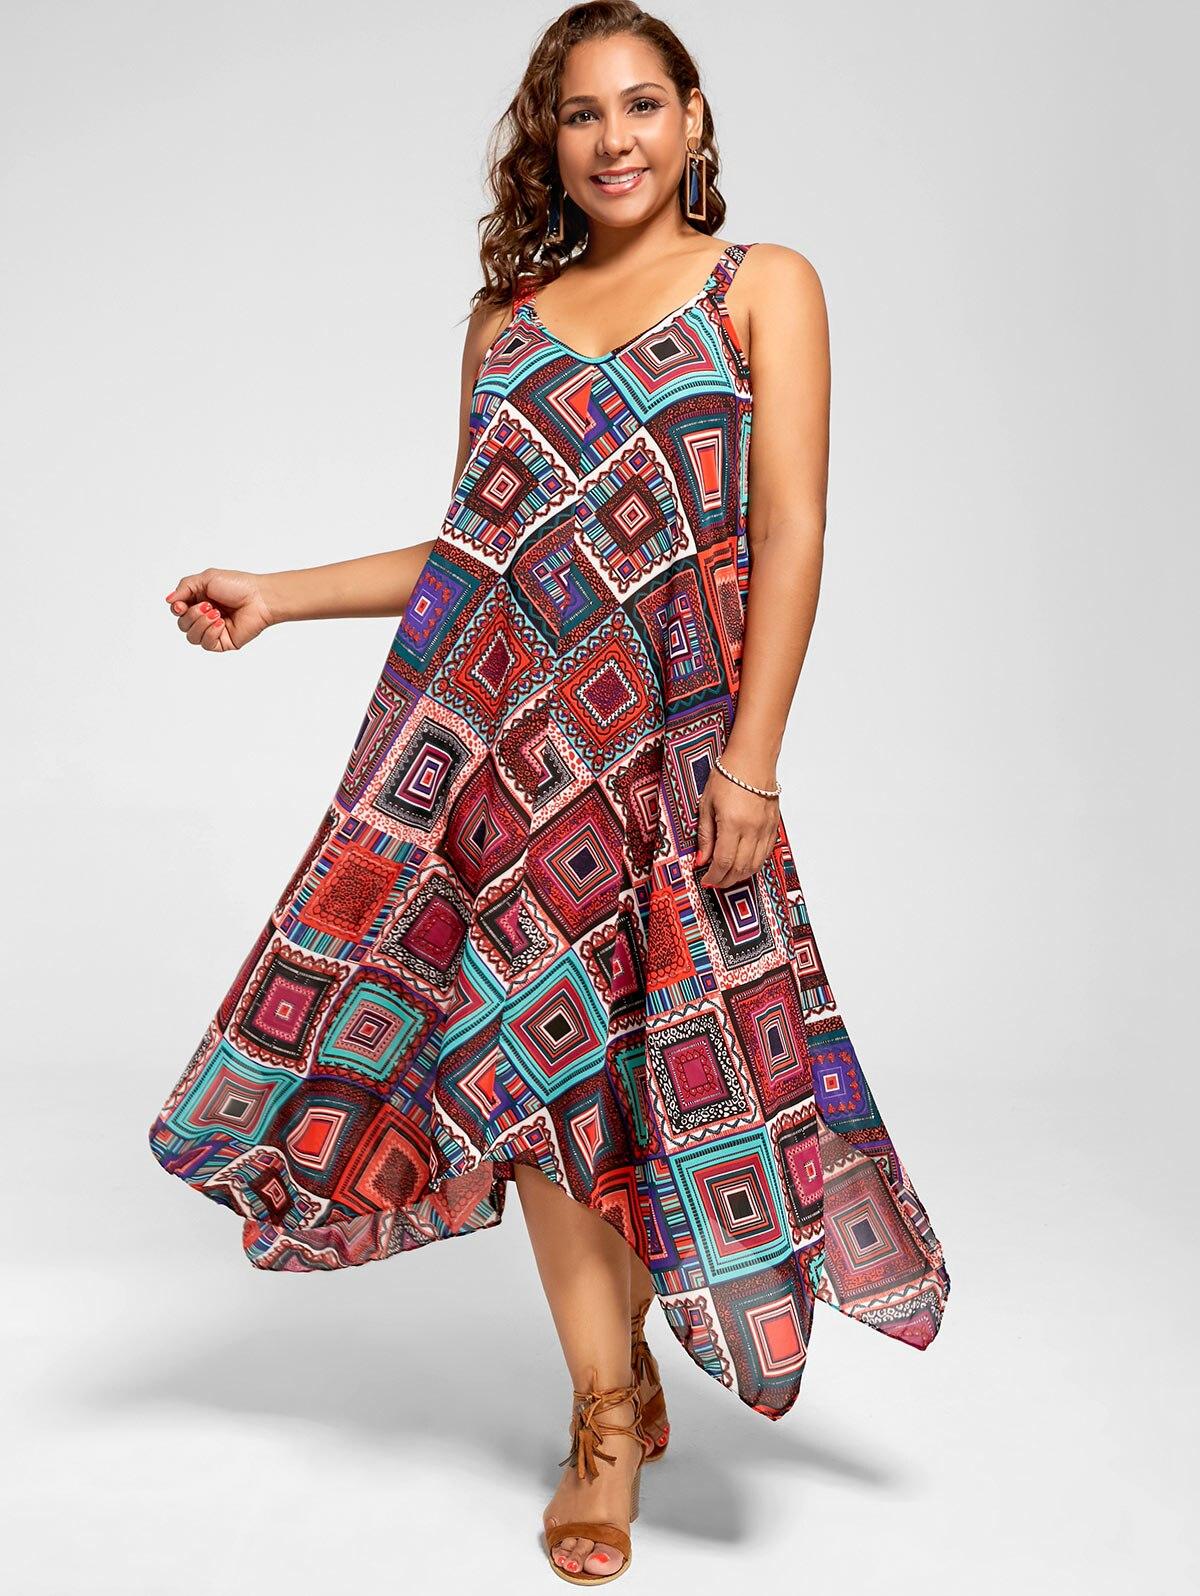 29fa2c7610a01 Gamiss Summer Women Plus Size 5XL Spaghetti Strap Geometric Print ...